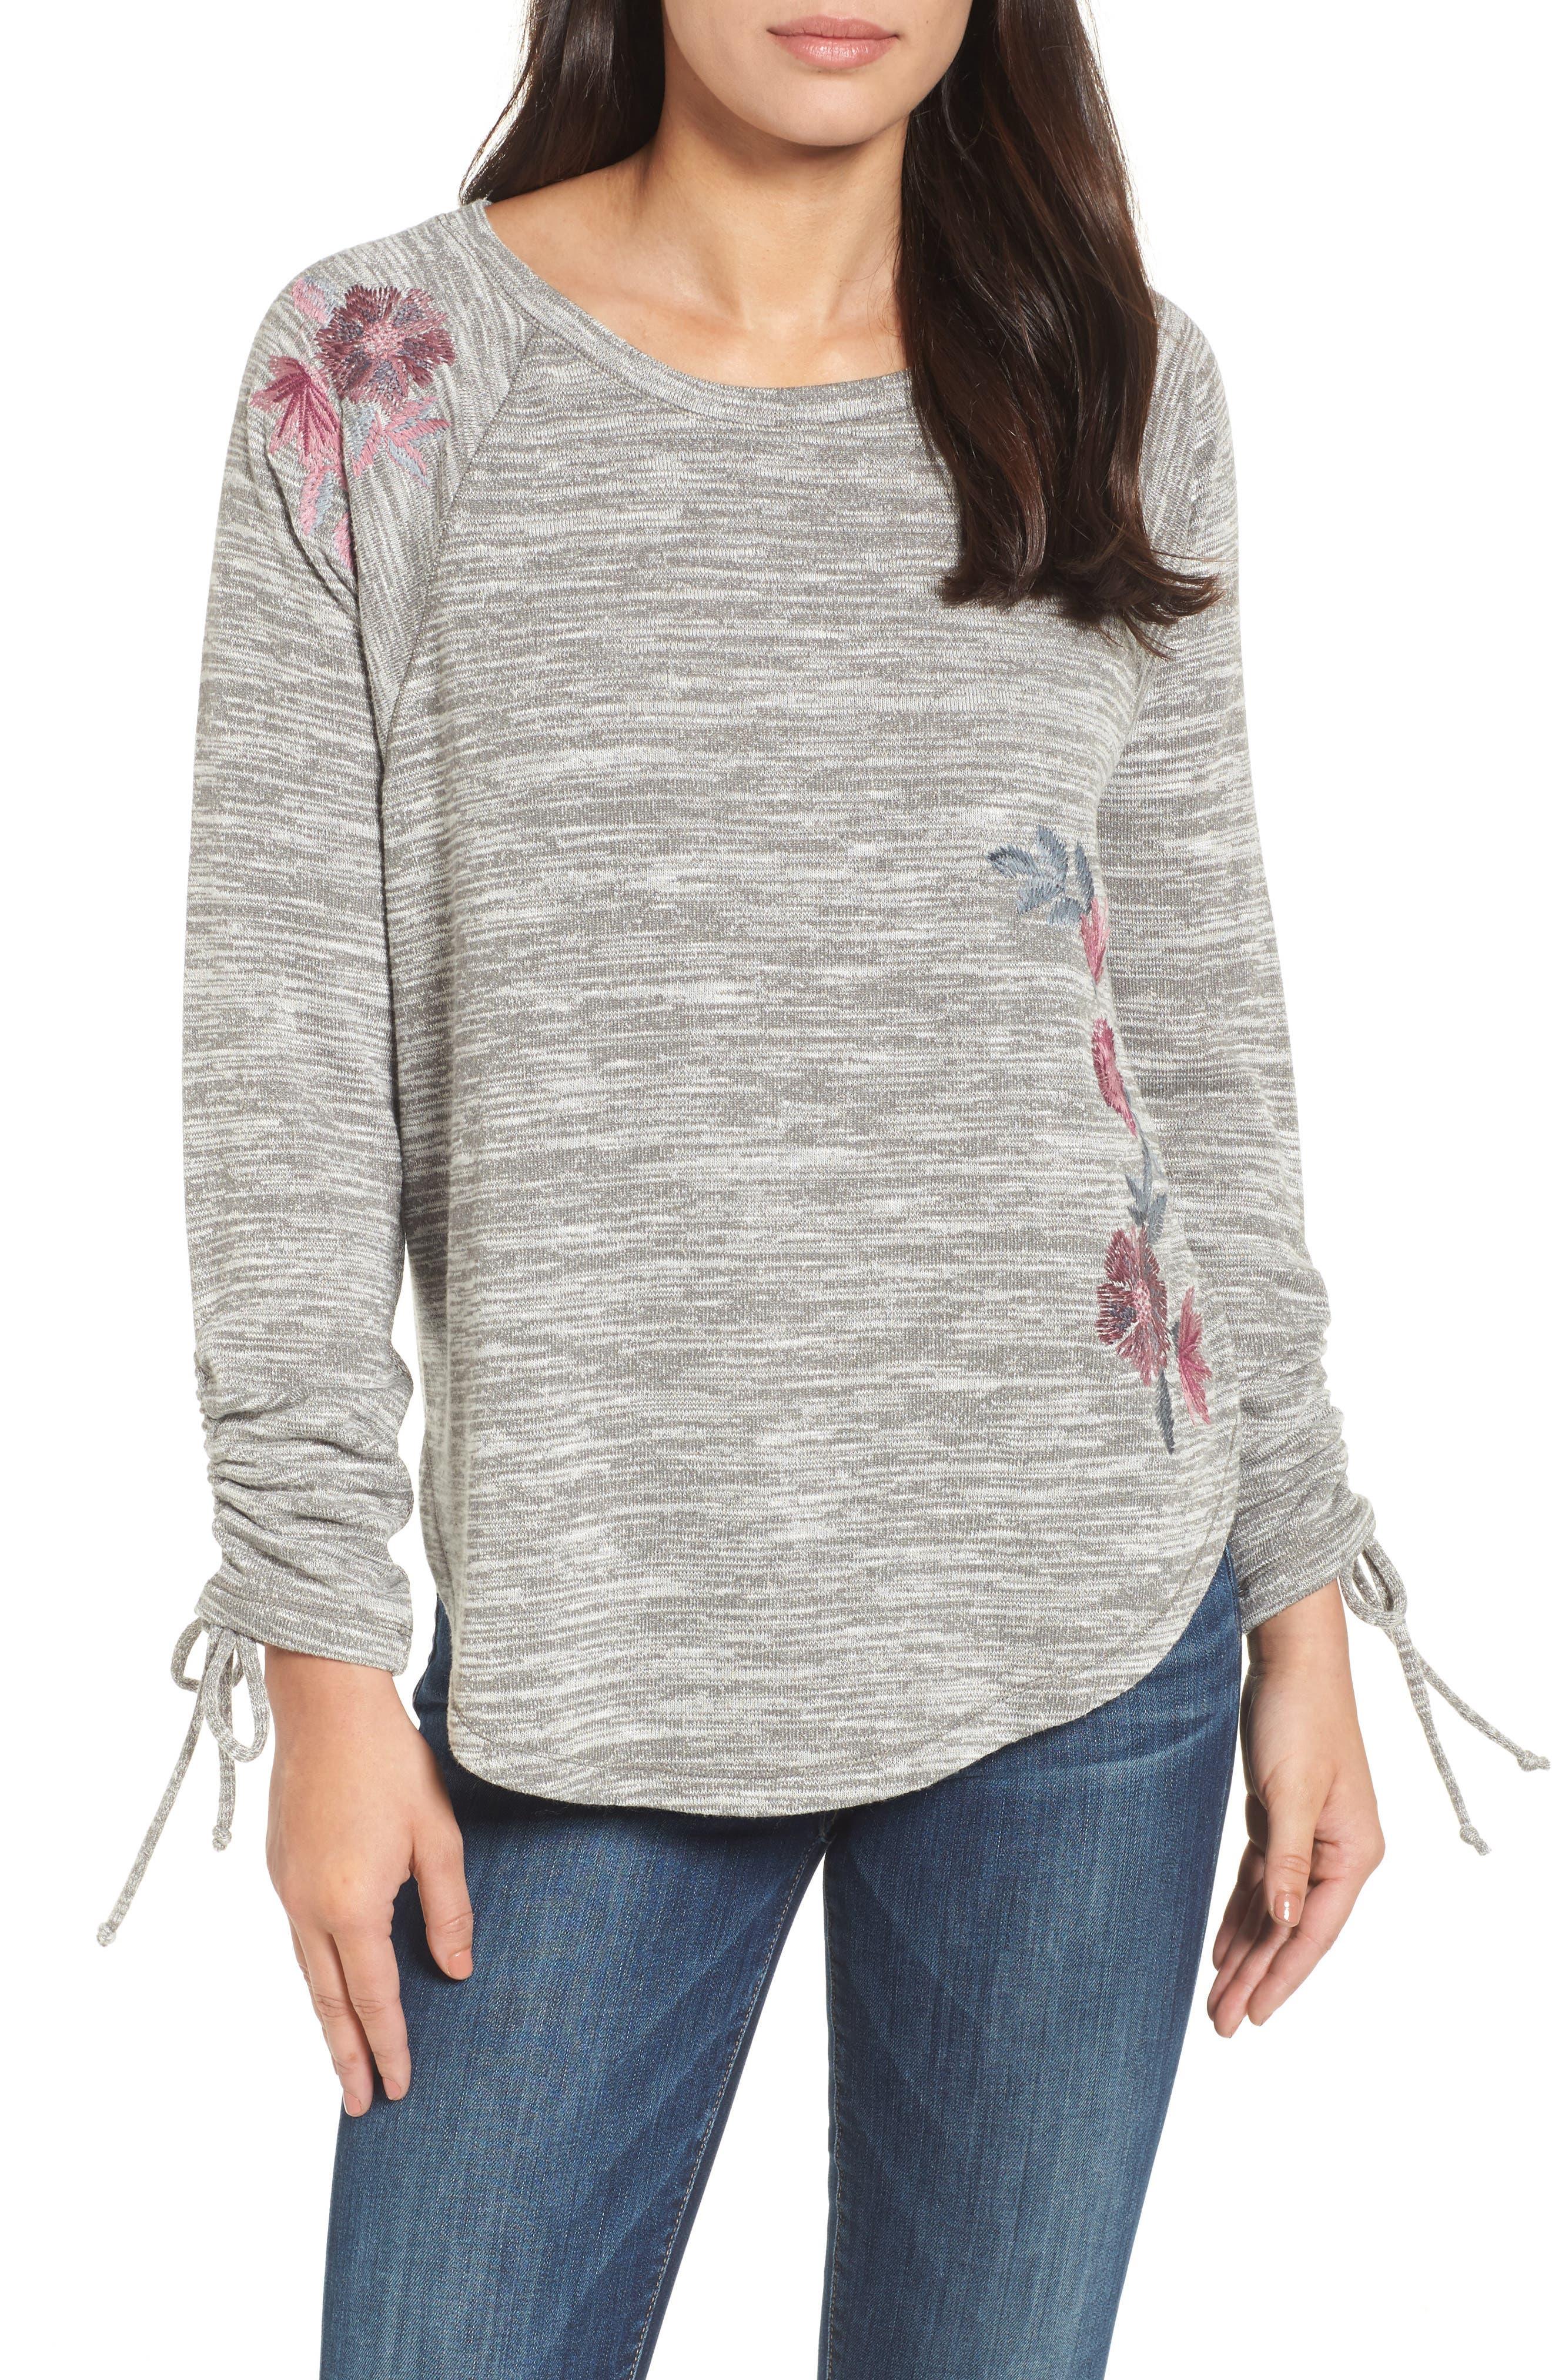 Hacci Embroidered Sweatshirt,                         Main,                         color, 022